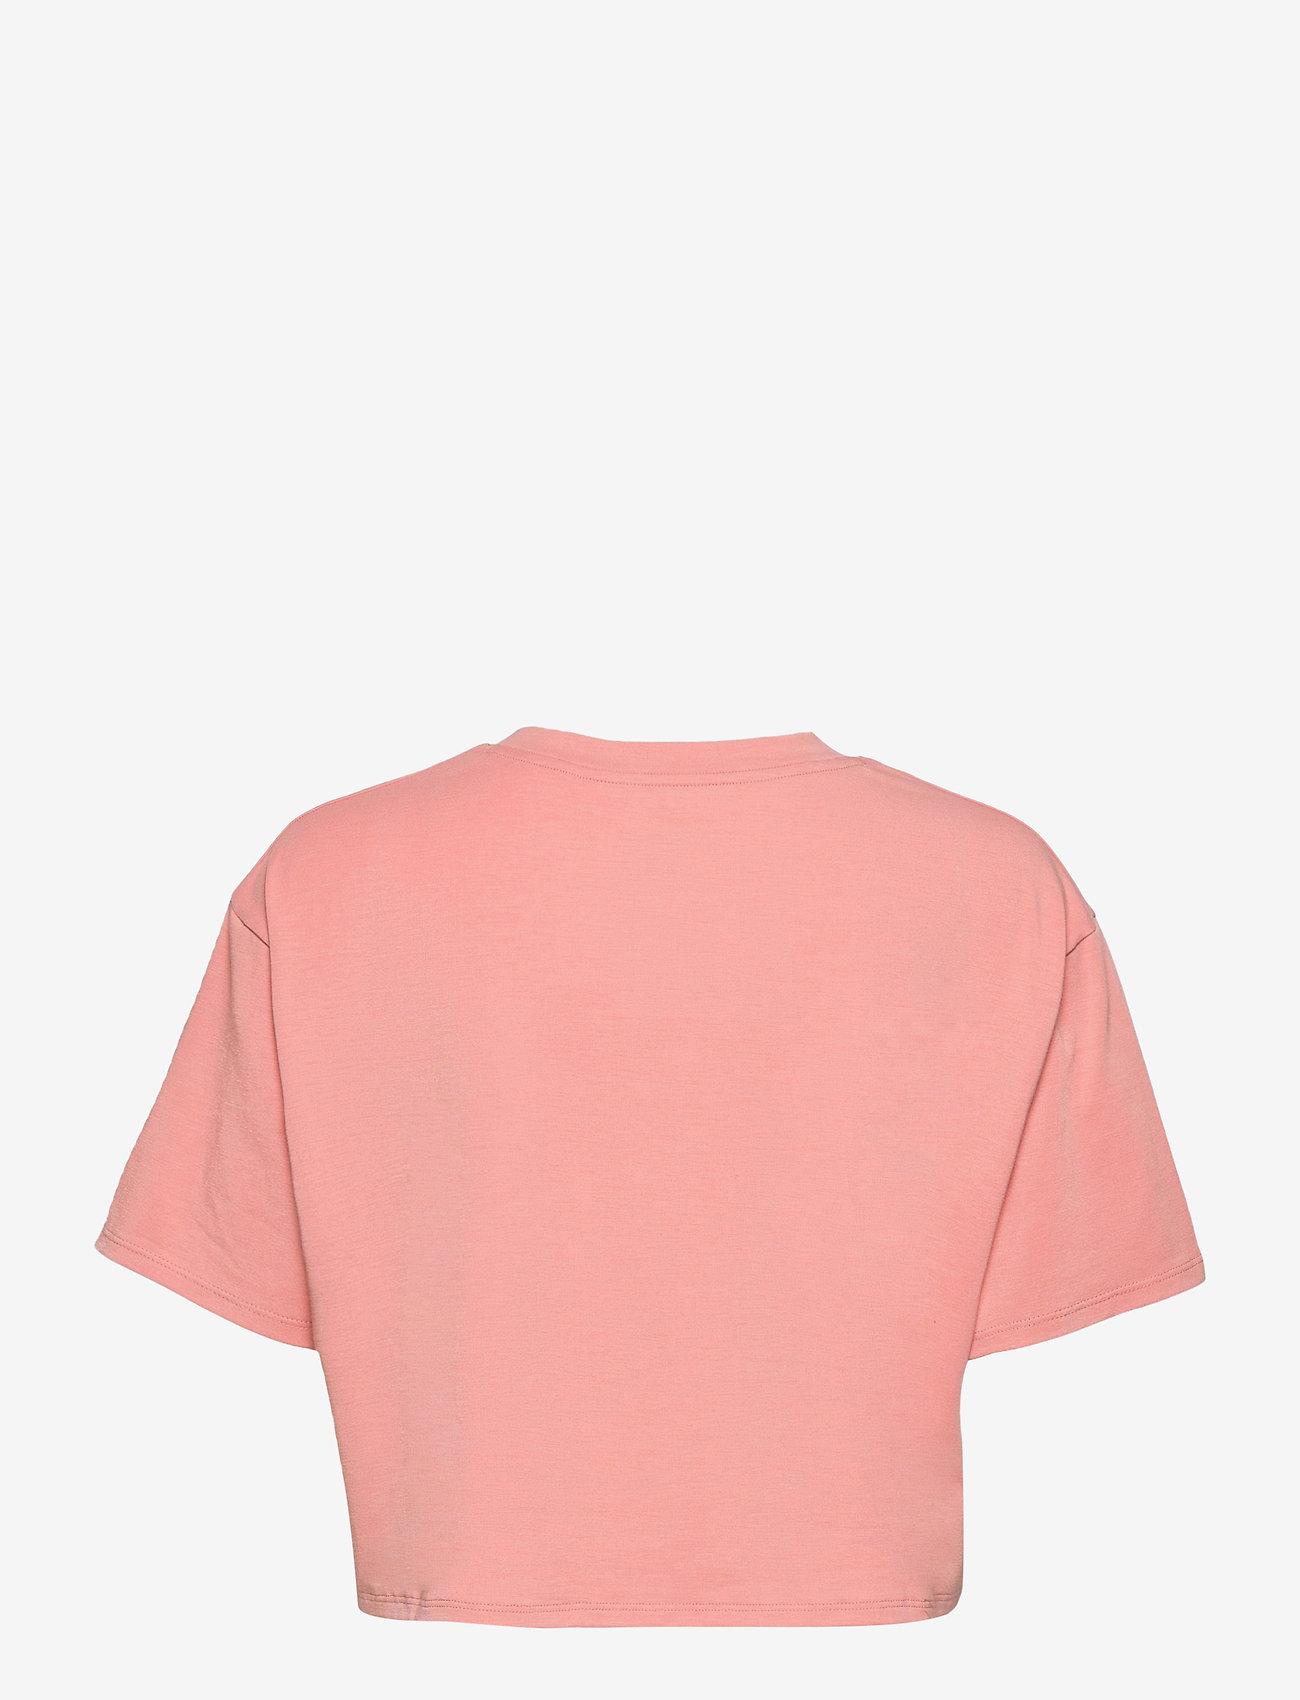 2XU - FORM CROP TEE - navel shirts - rosette/sherbert - 1